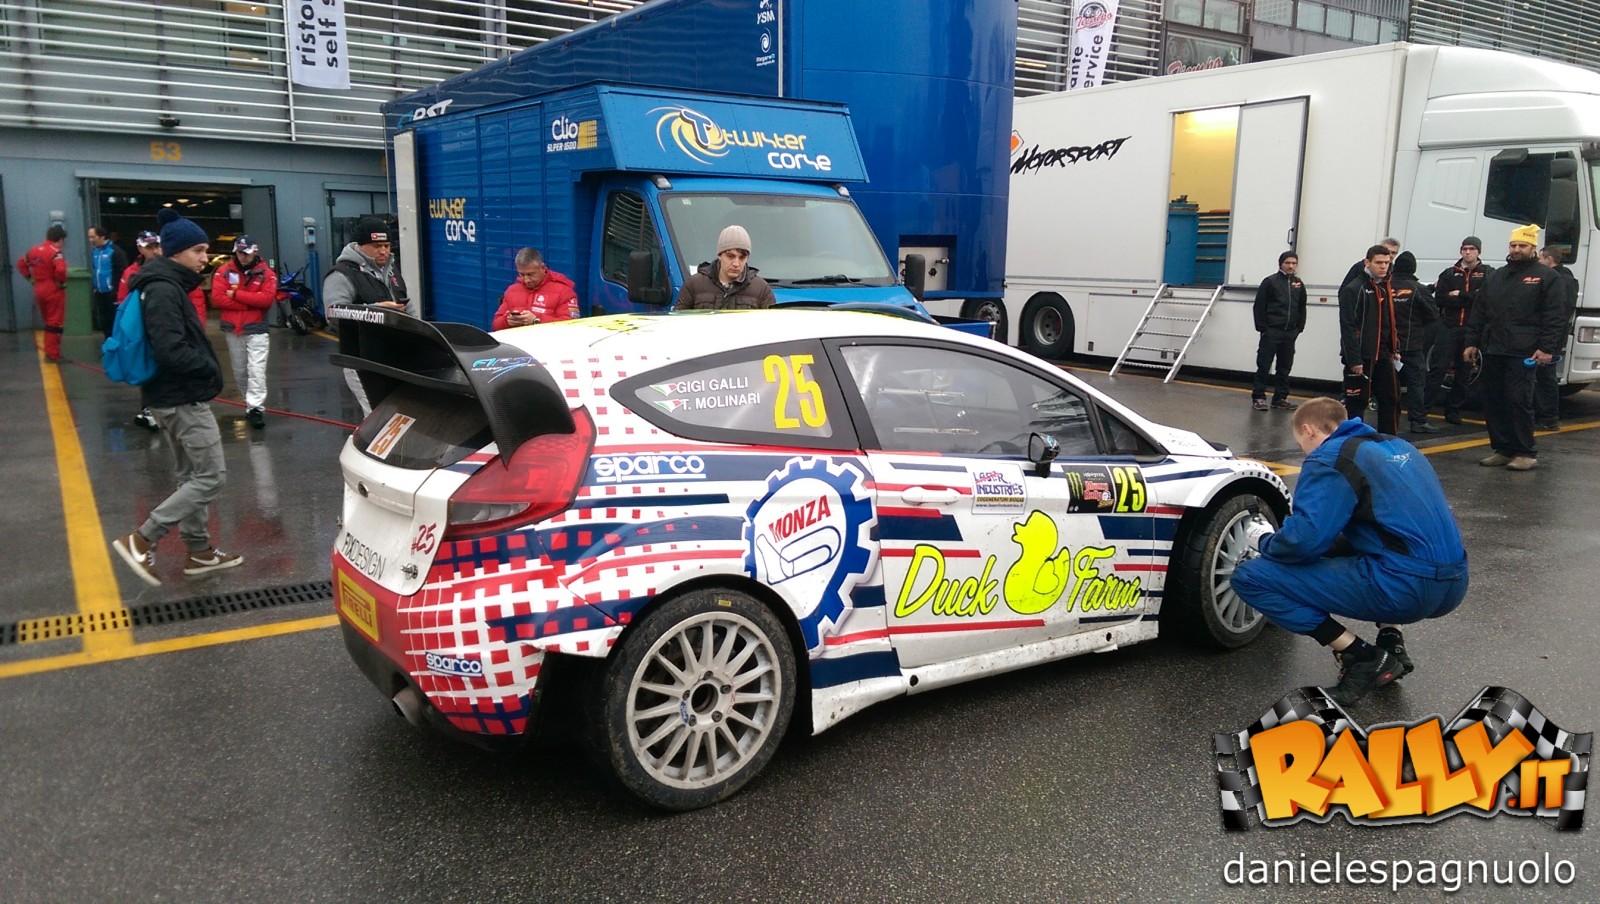 Gigi Galli Monza Rally 2014